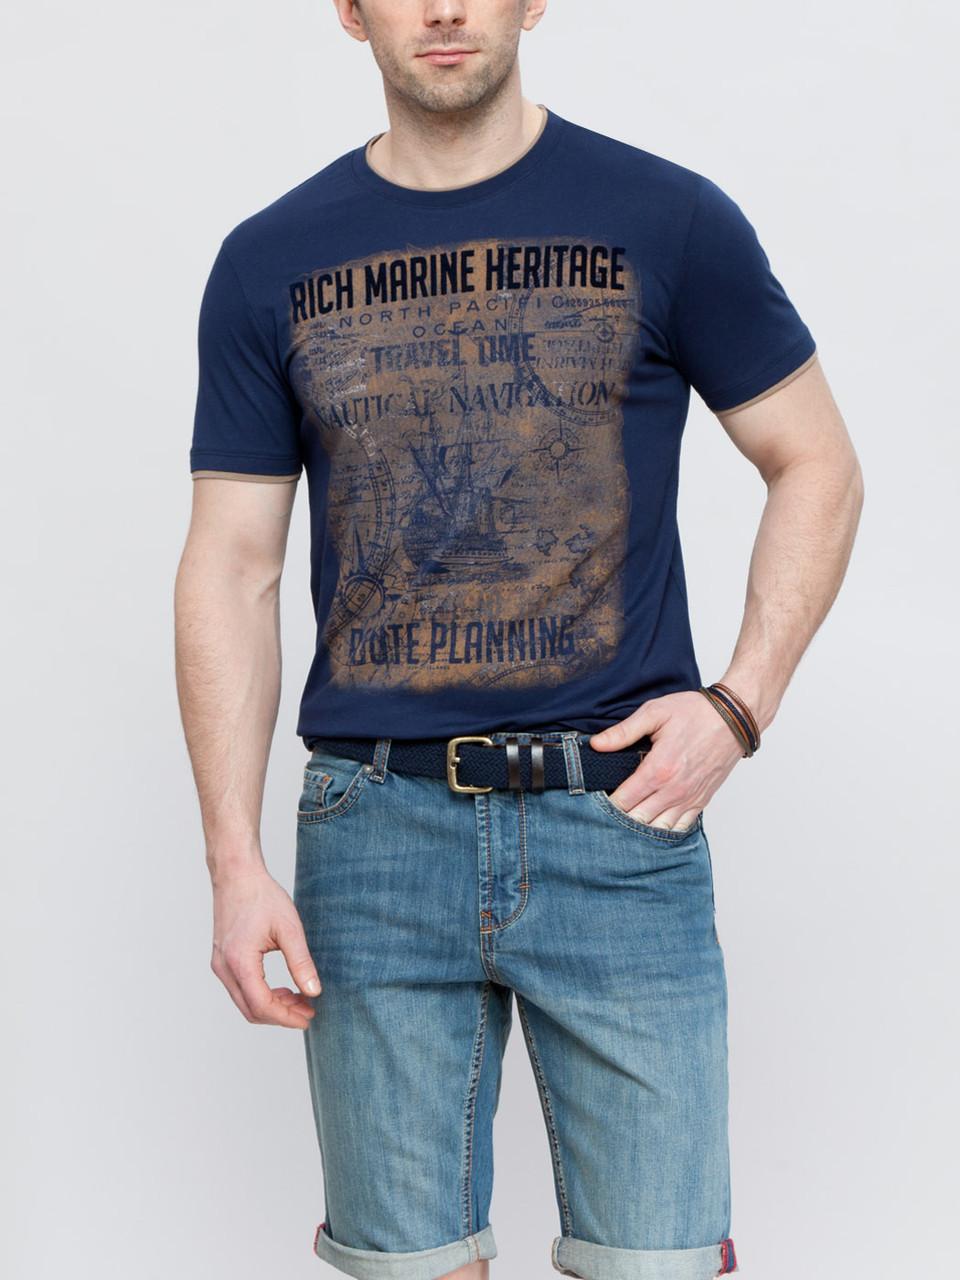 Темно-синяя мужская футболка LC Waikiki с бархатным рисунком RICH MARINE HERITAGE